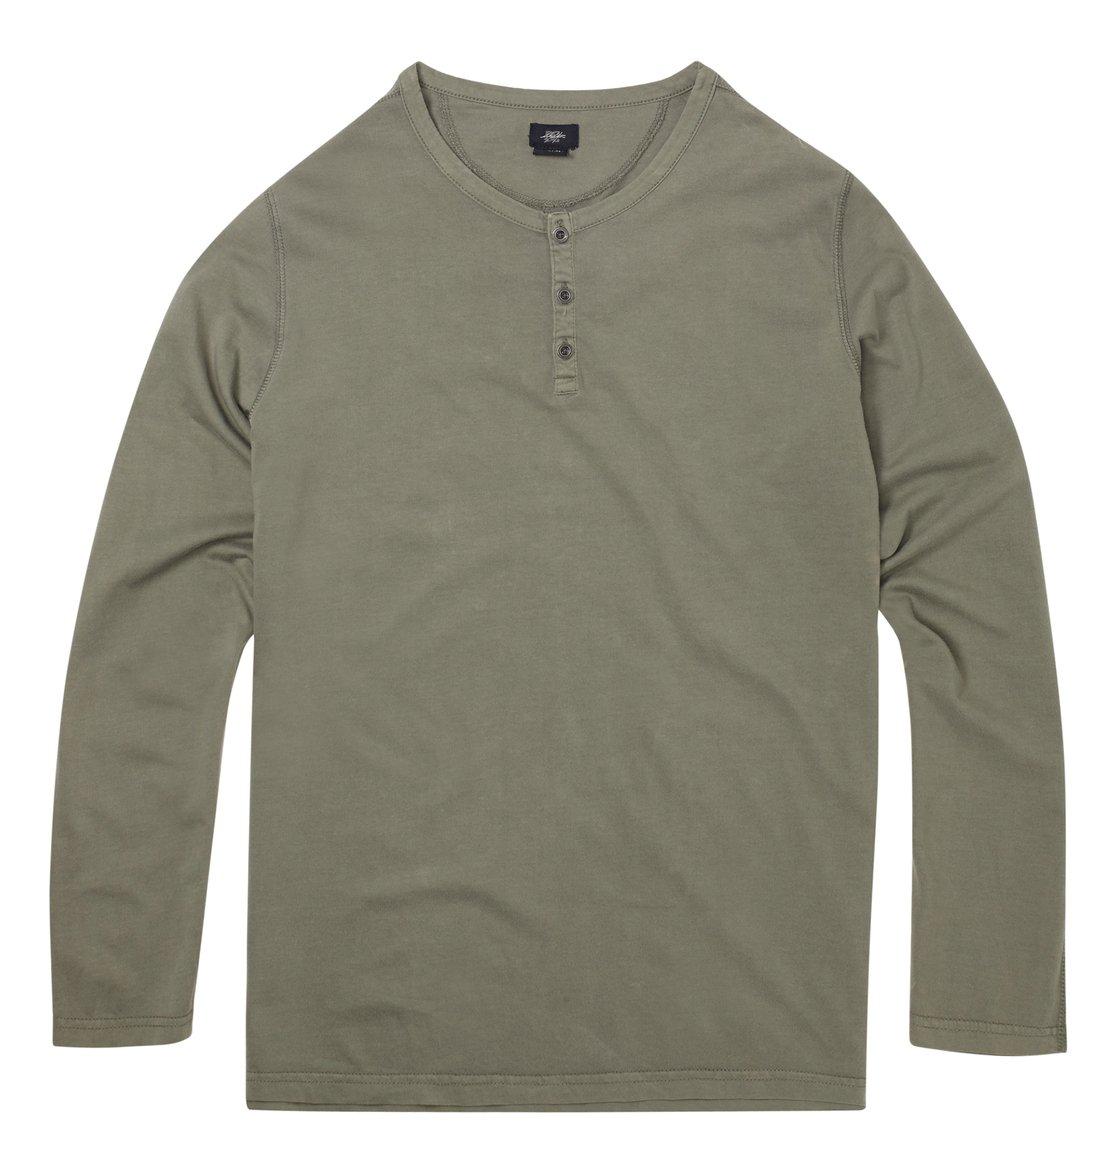 Men's Chris Cole Crescent Henley Shirt